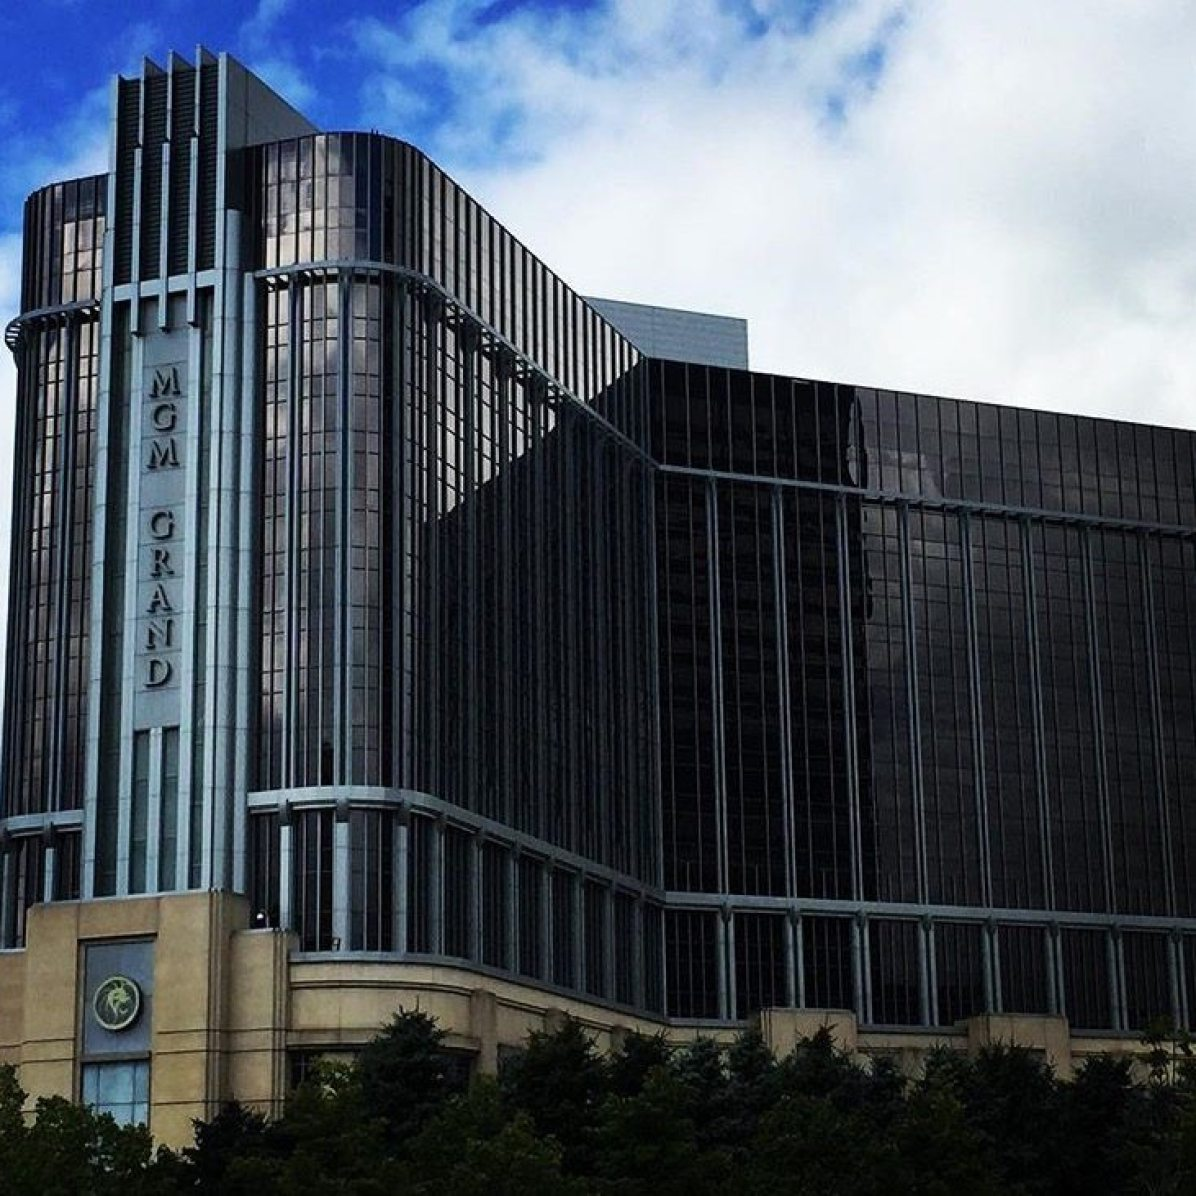 Mgm casino detroit restaurants